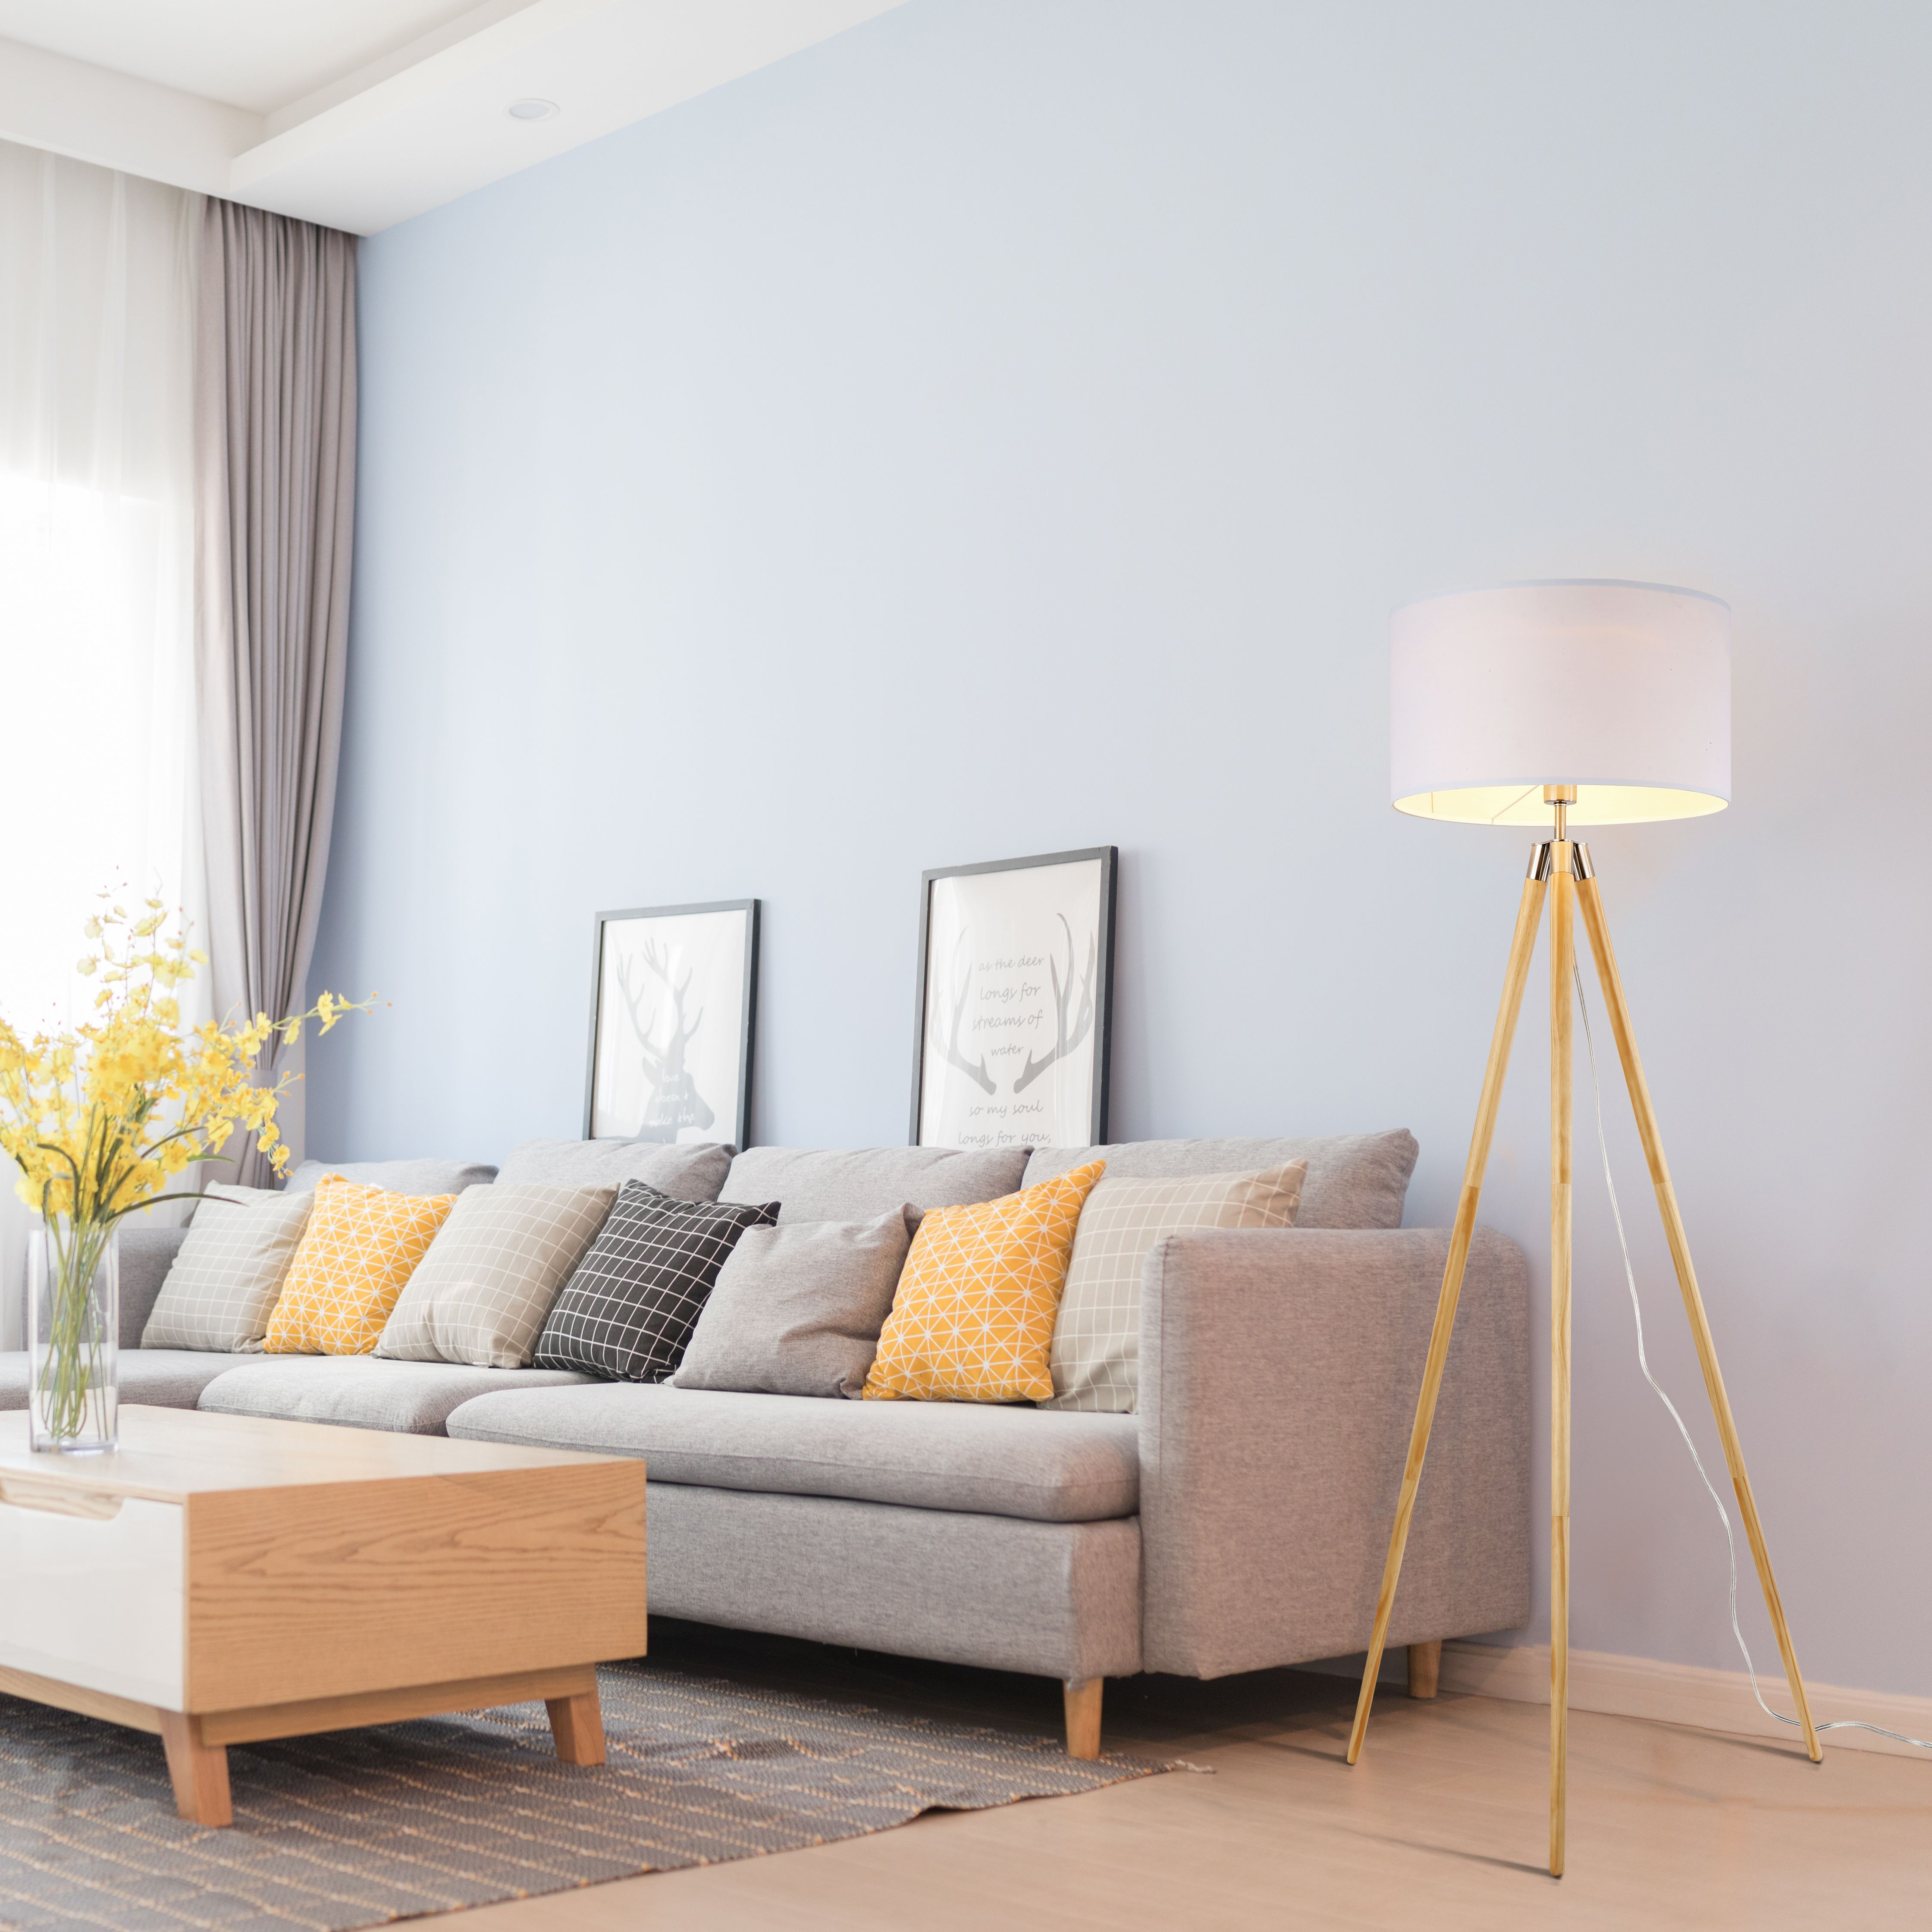 Celeste Tripod Floor Lamp in 2019 | Lighting | Contemporary floor ...